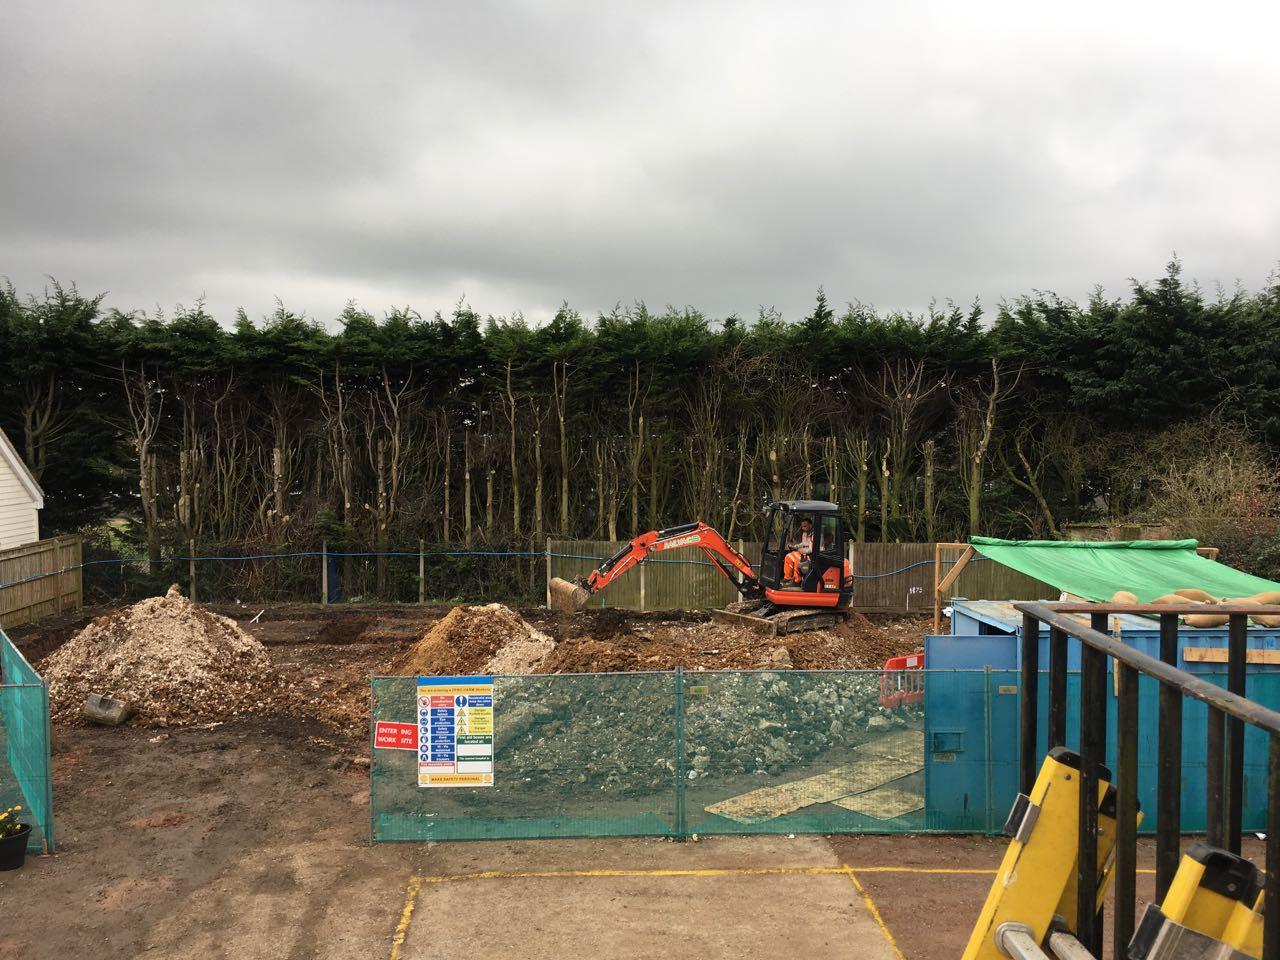 Excavator in action